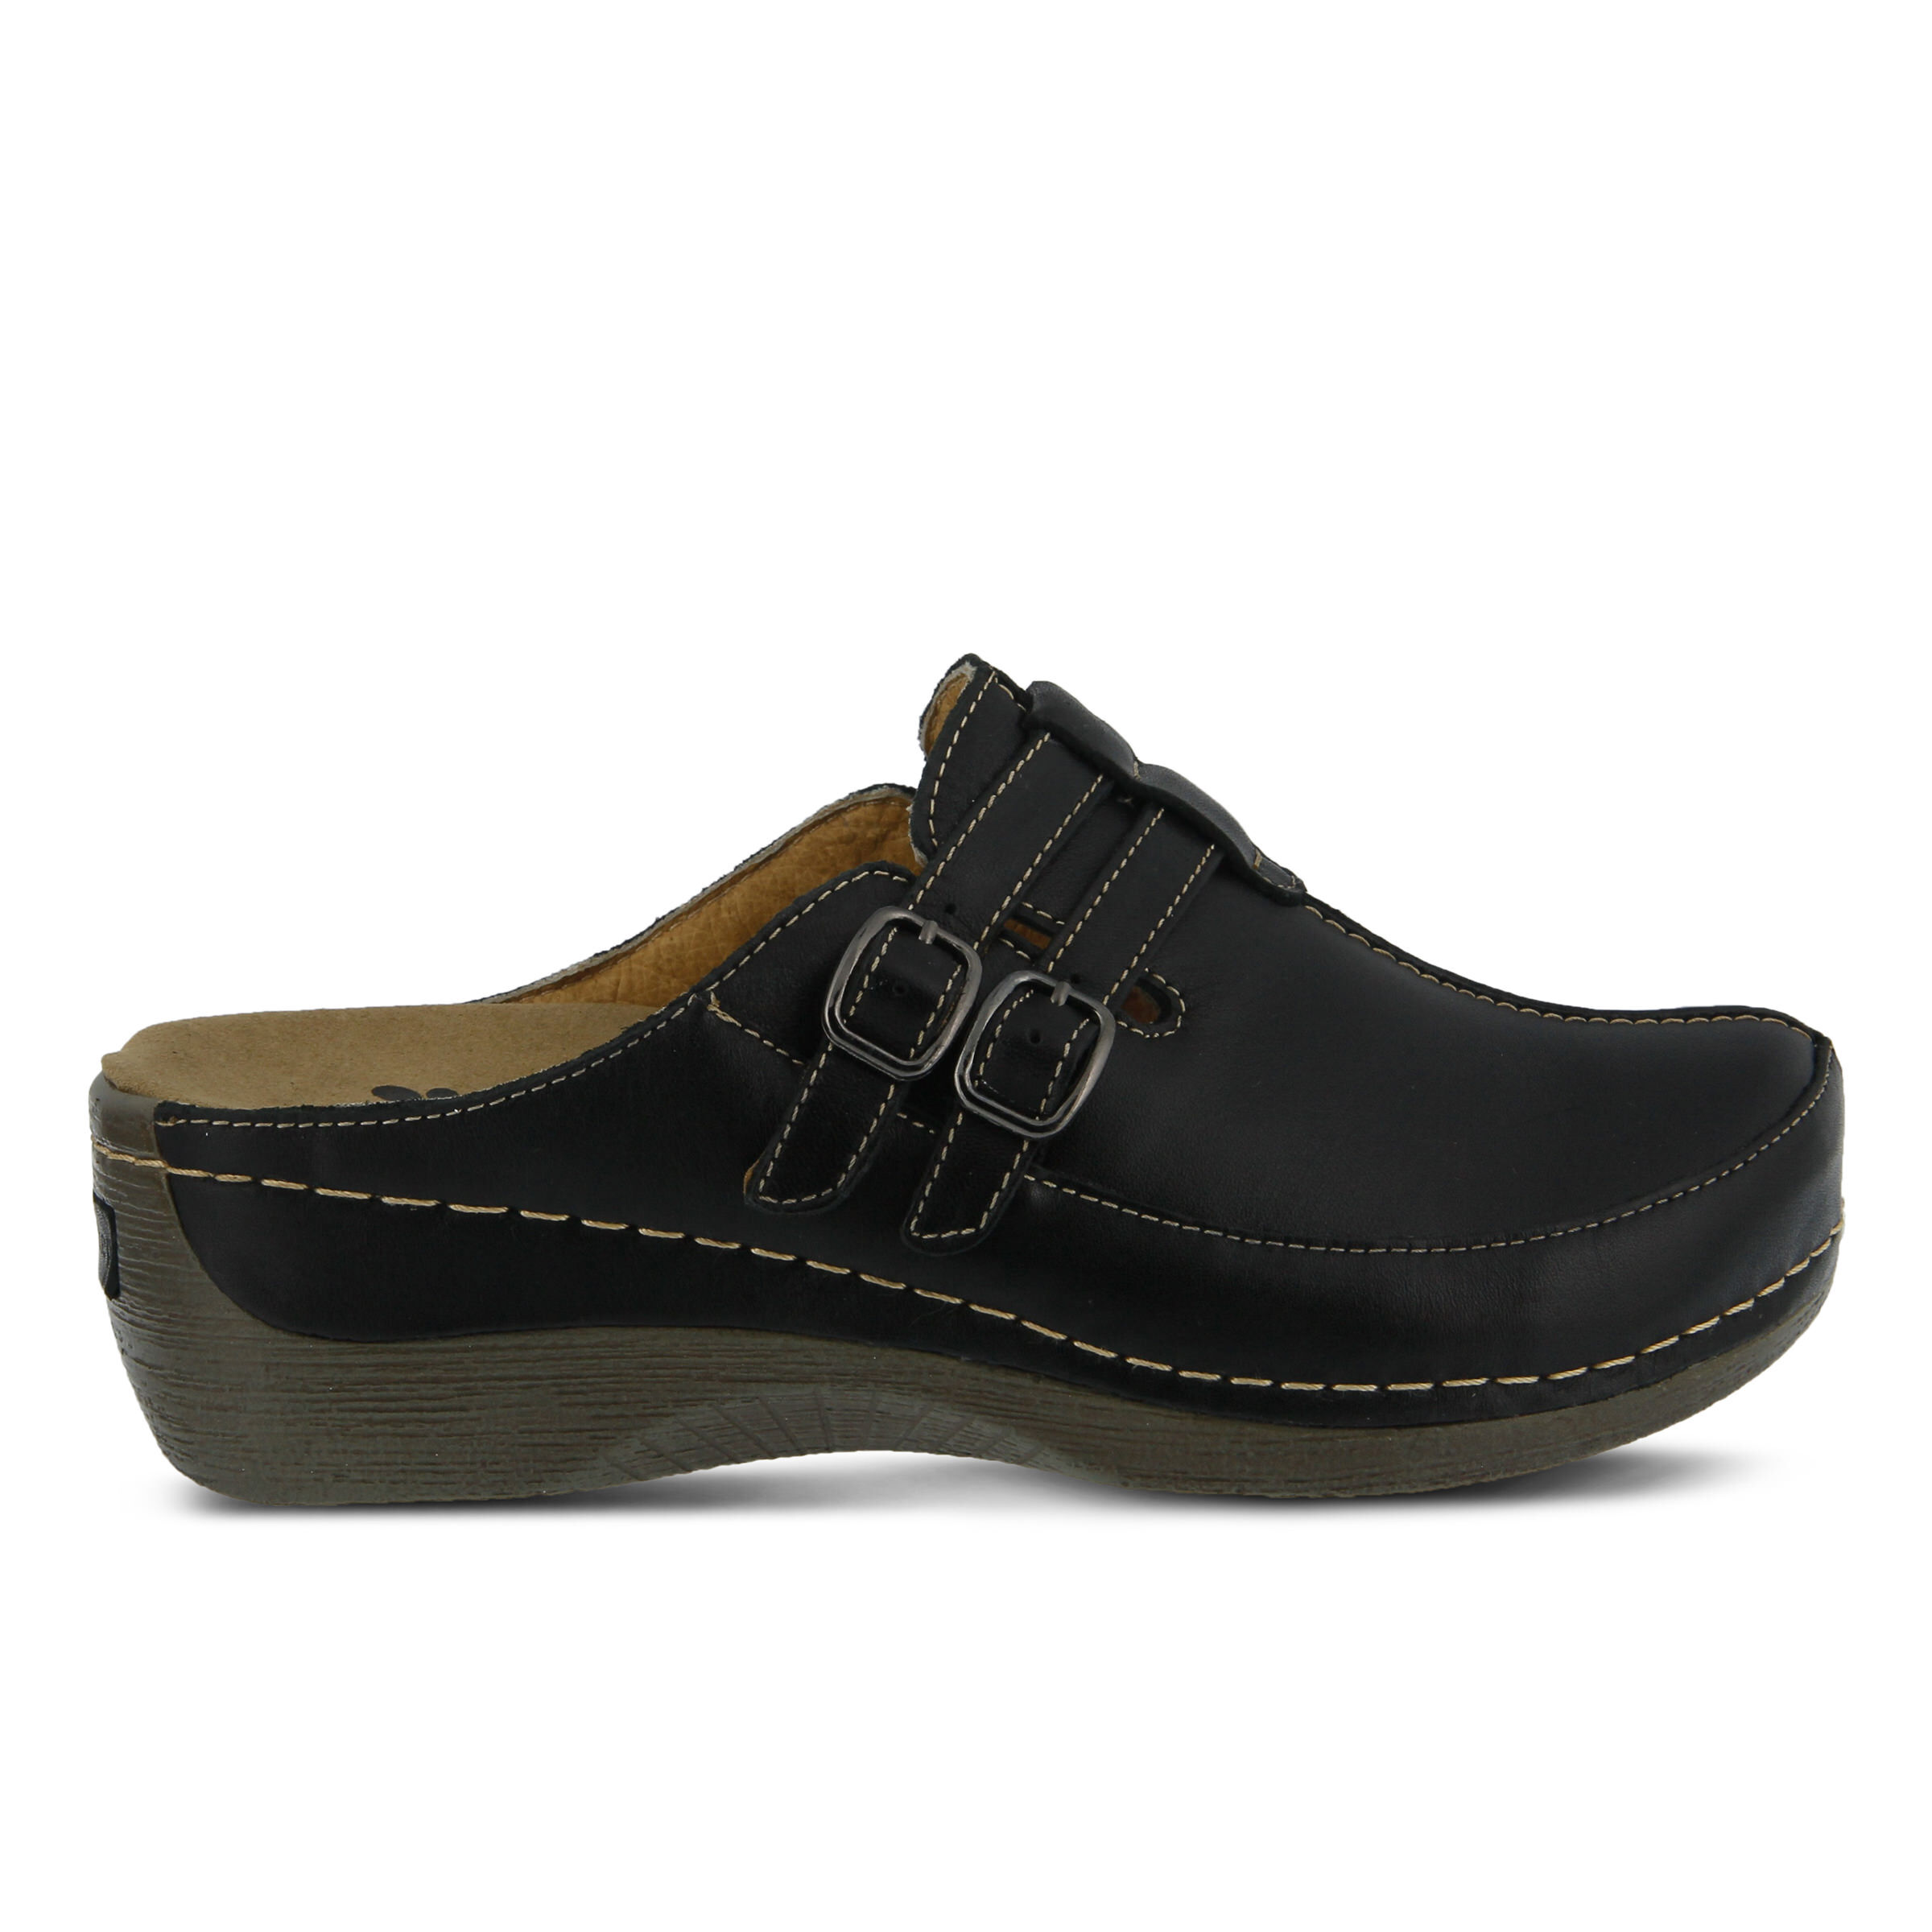 Women's SPRING STEP Happy Clogs Black